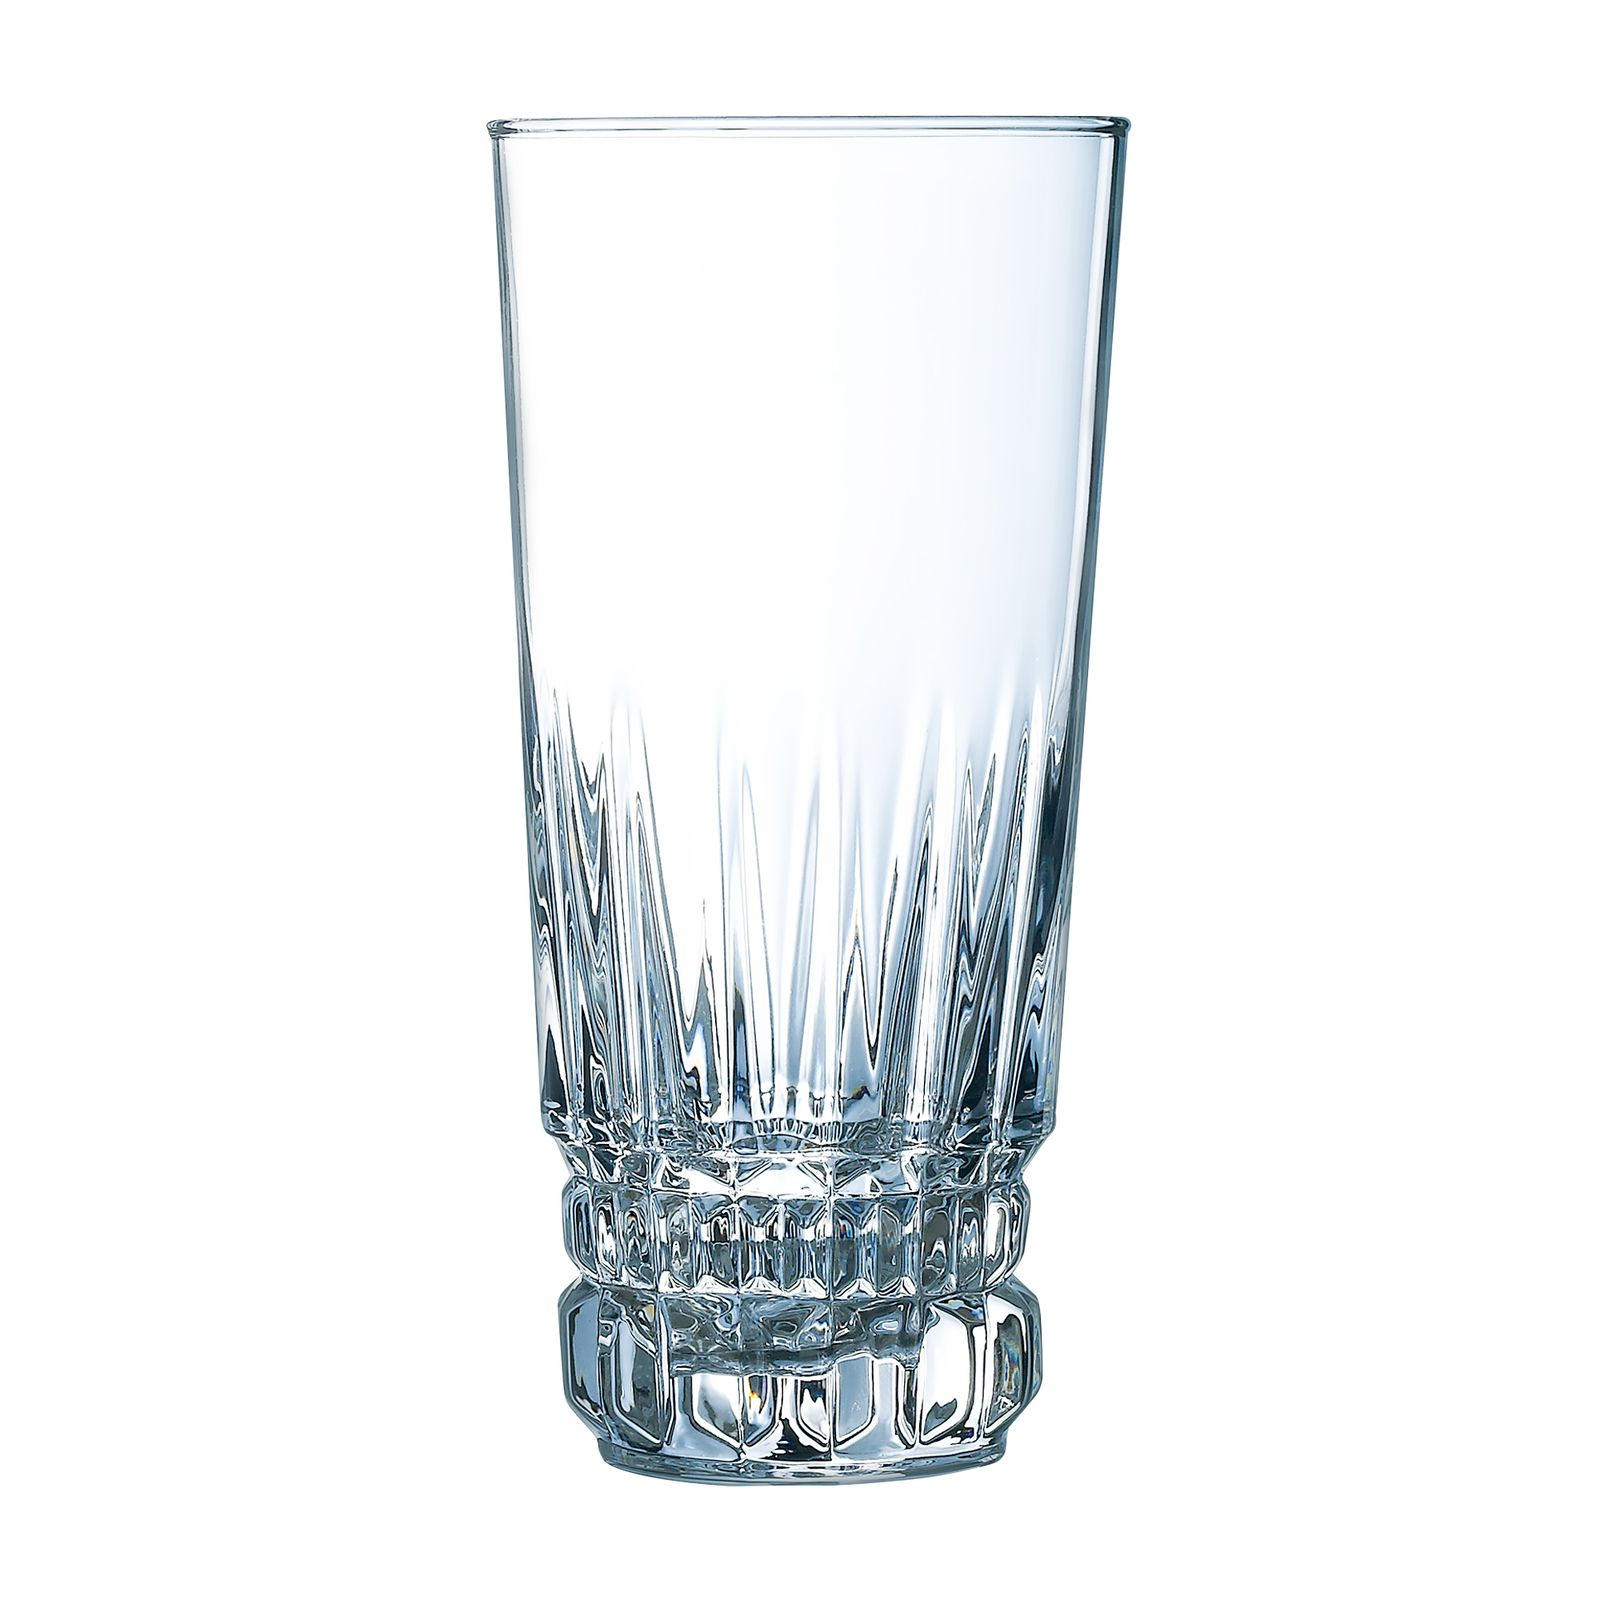 Set of 6 glasses Imperator 310 ml LUMINARC